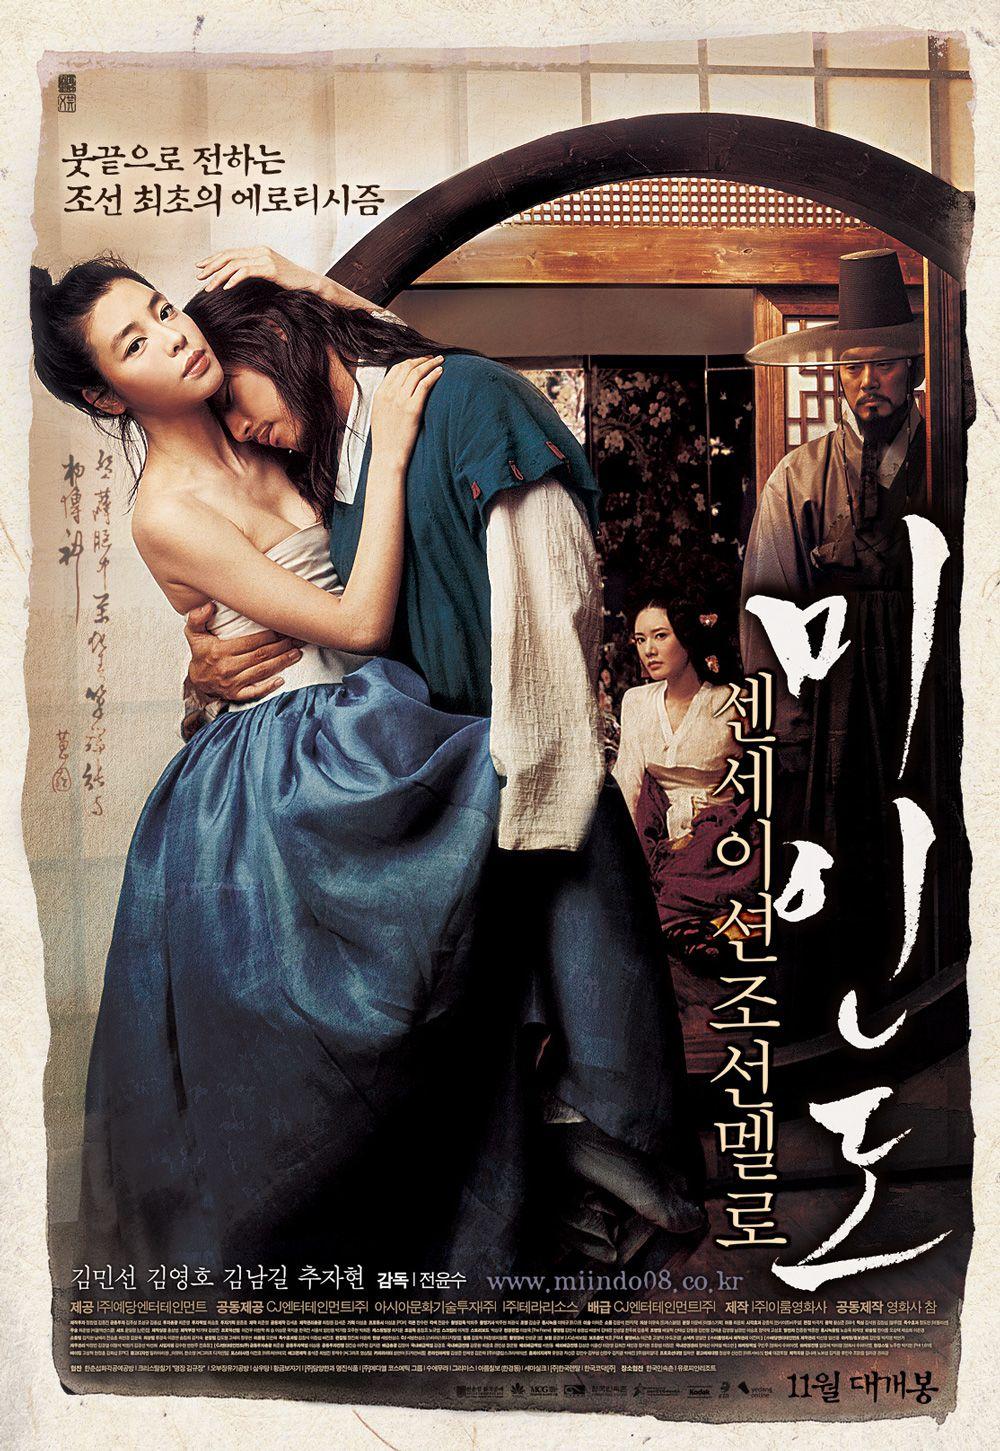 Miindo Poster-3.jpg